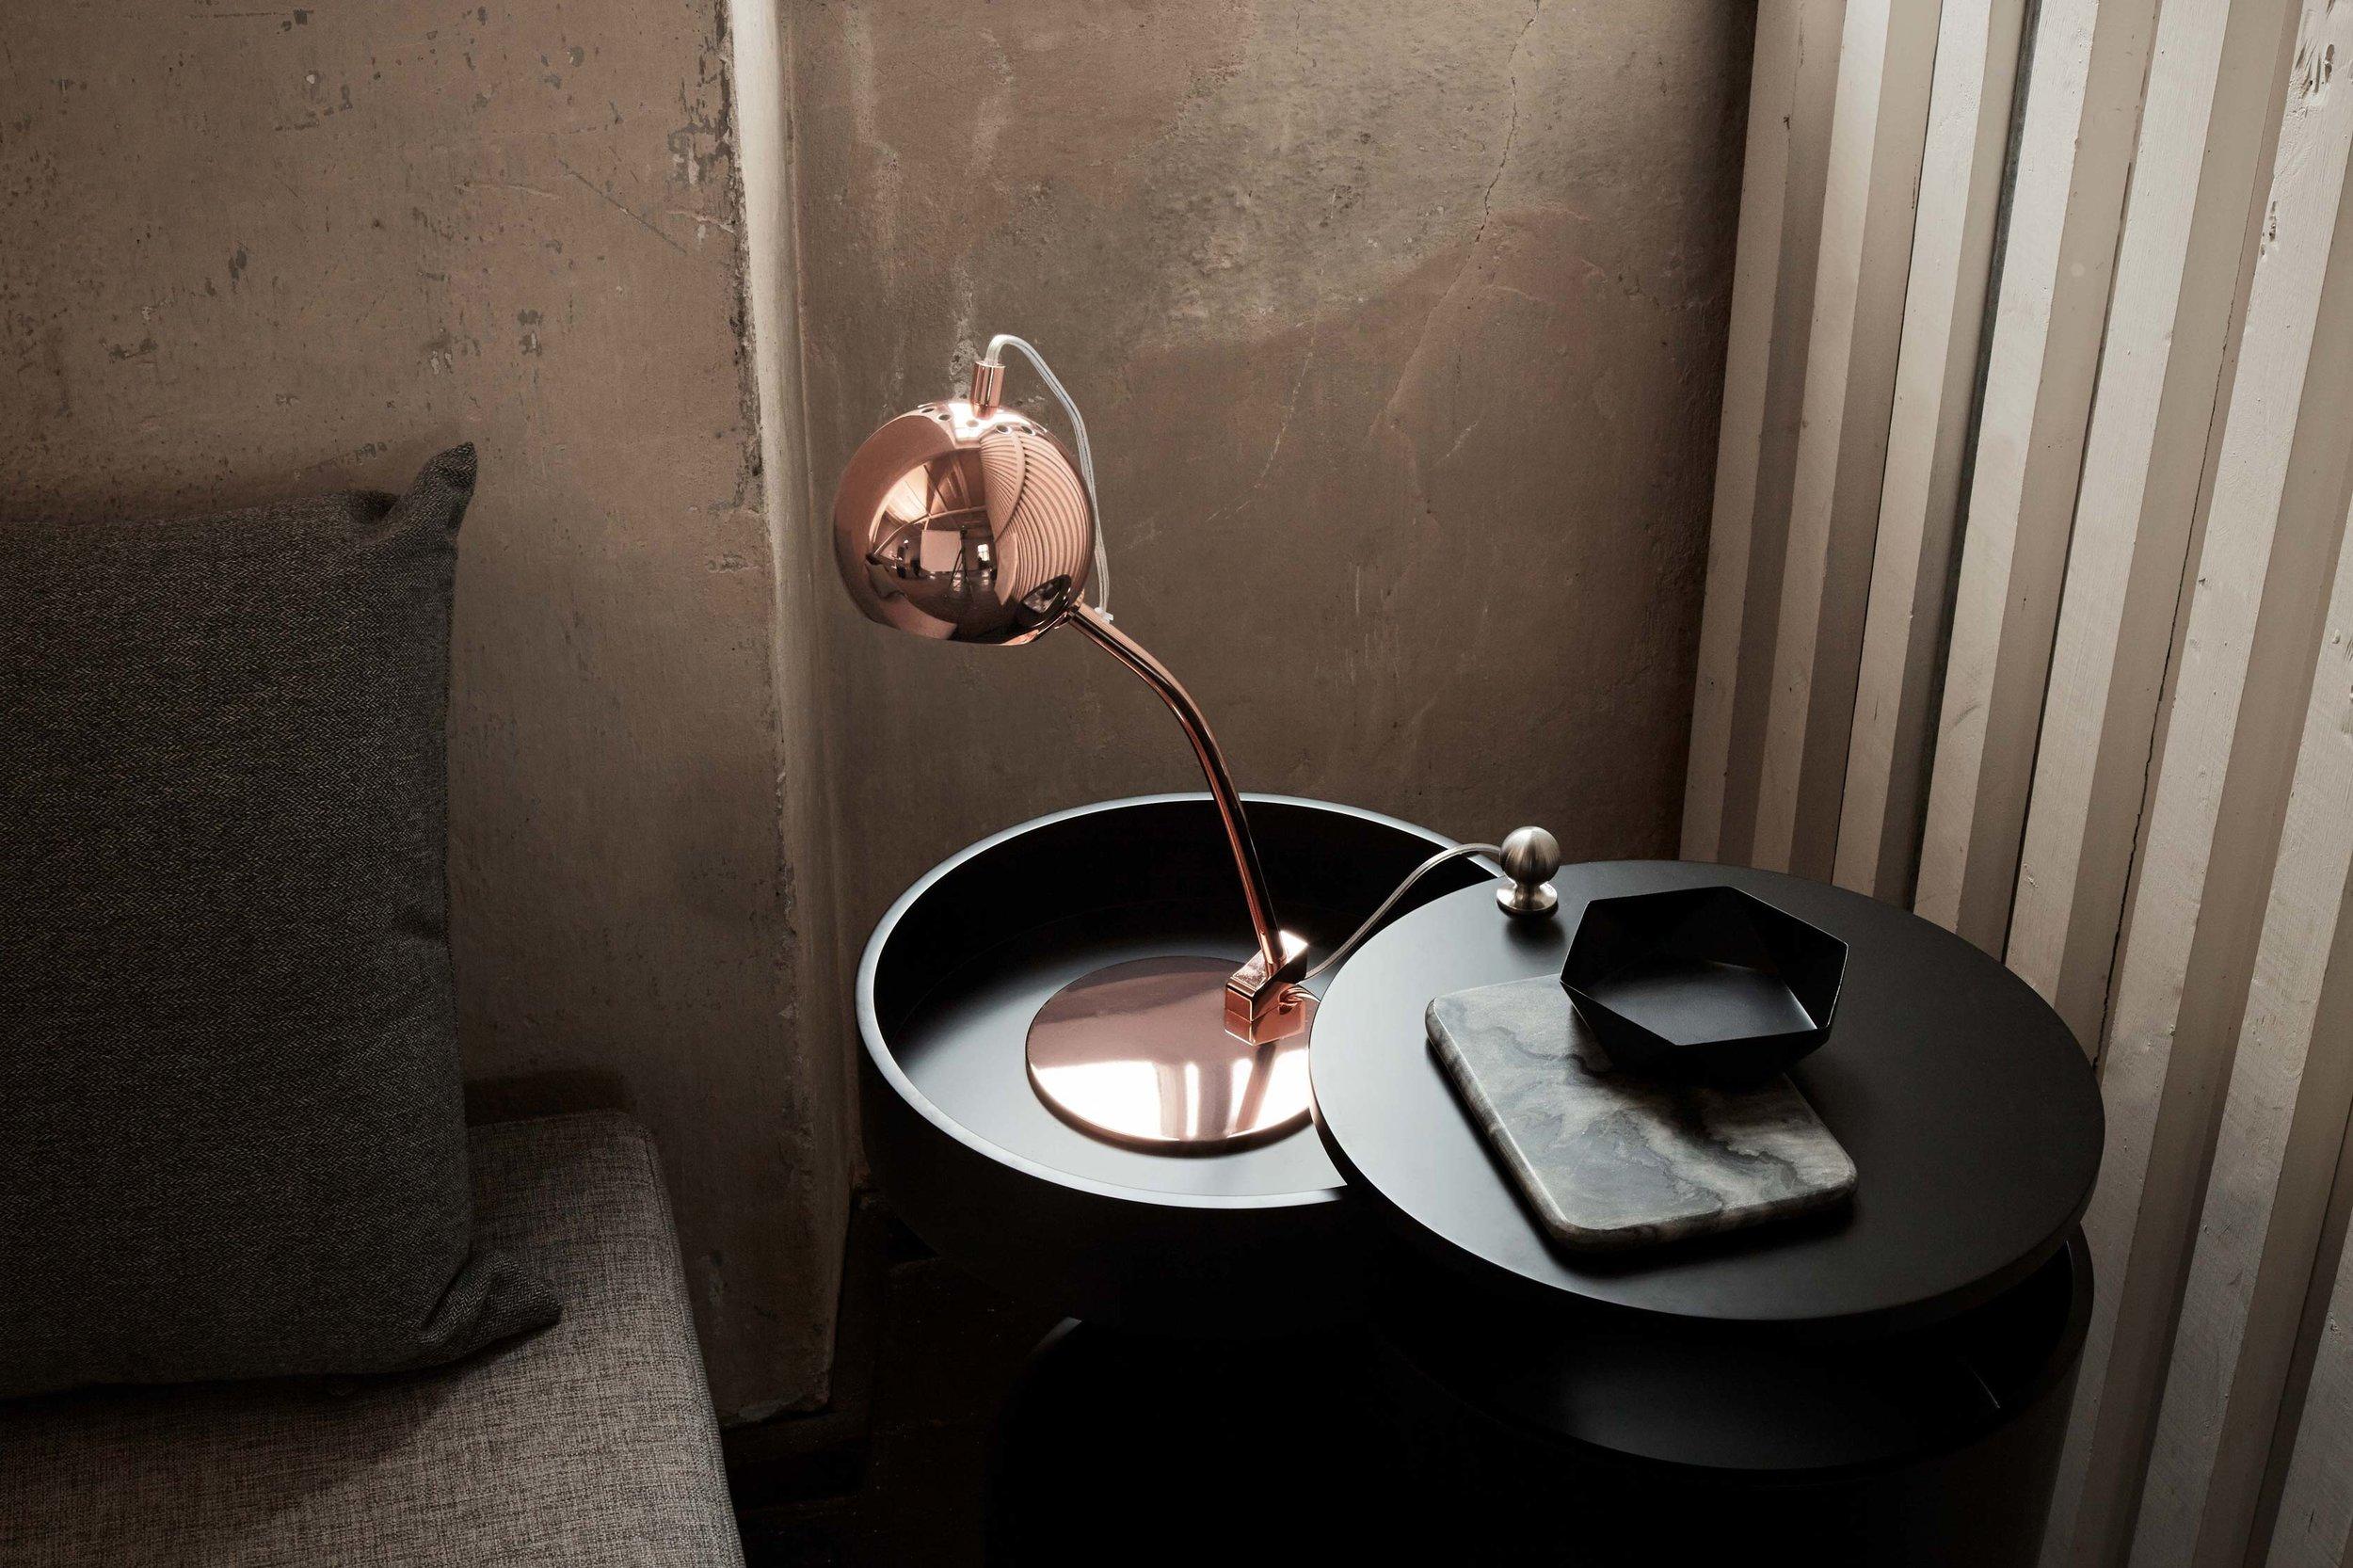 Ball-table-lamp-copper-glossy---lifestyle-Arsenalgaarden-2456.jpg